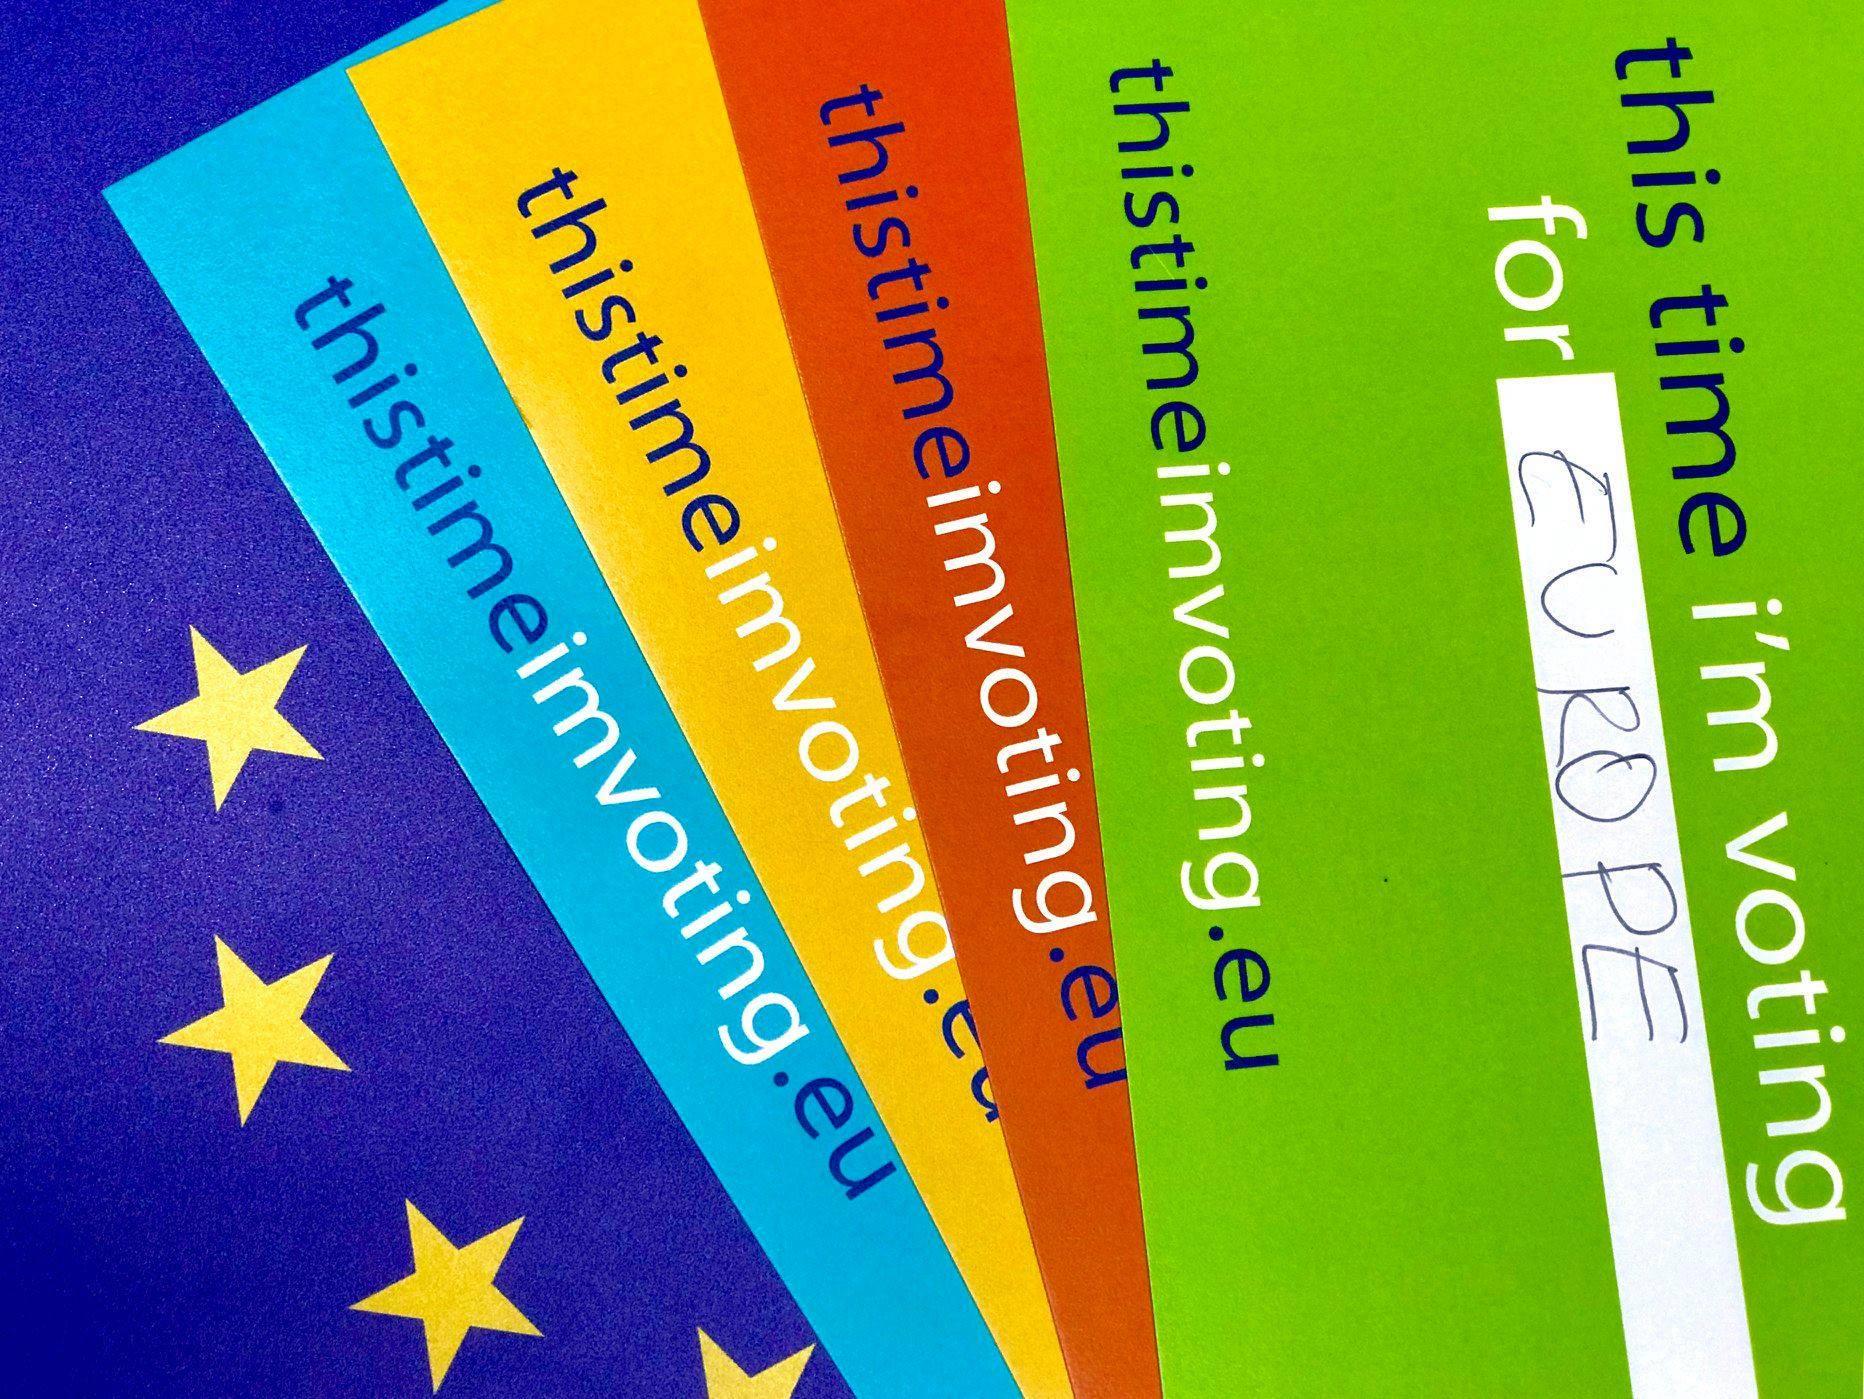 European Elections offline materials